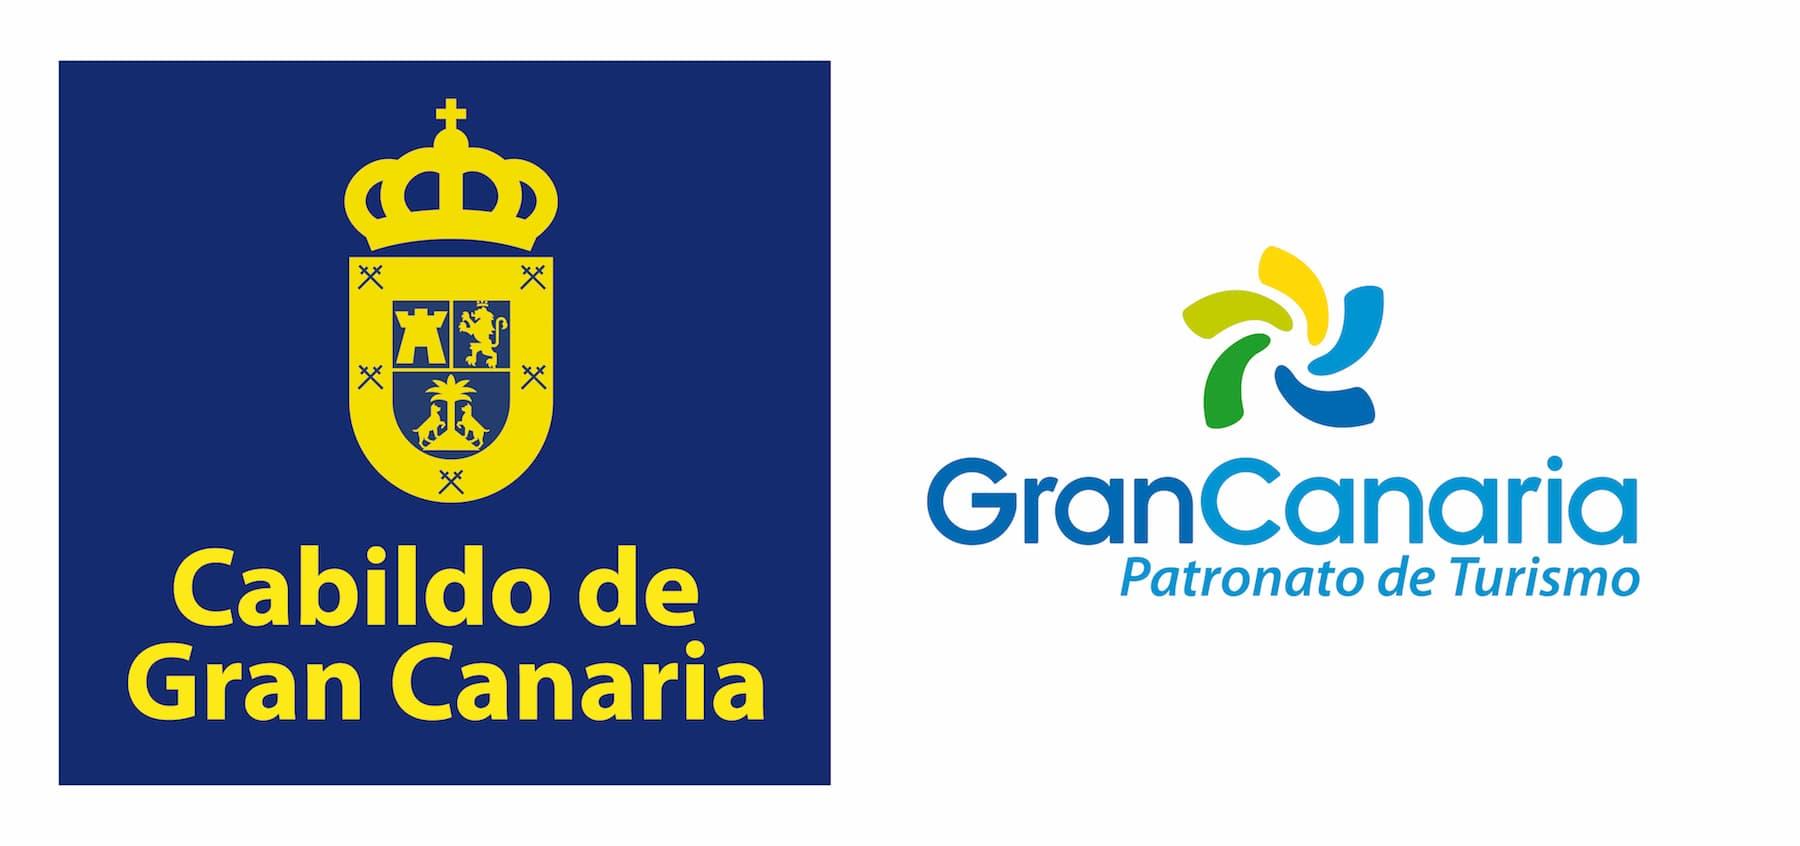 GC-cabildo-y-patronato-de-turismo